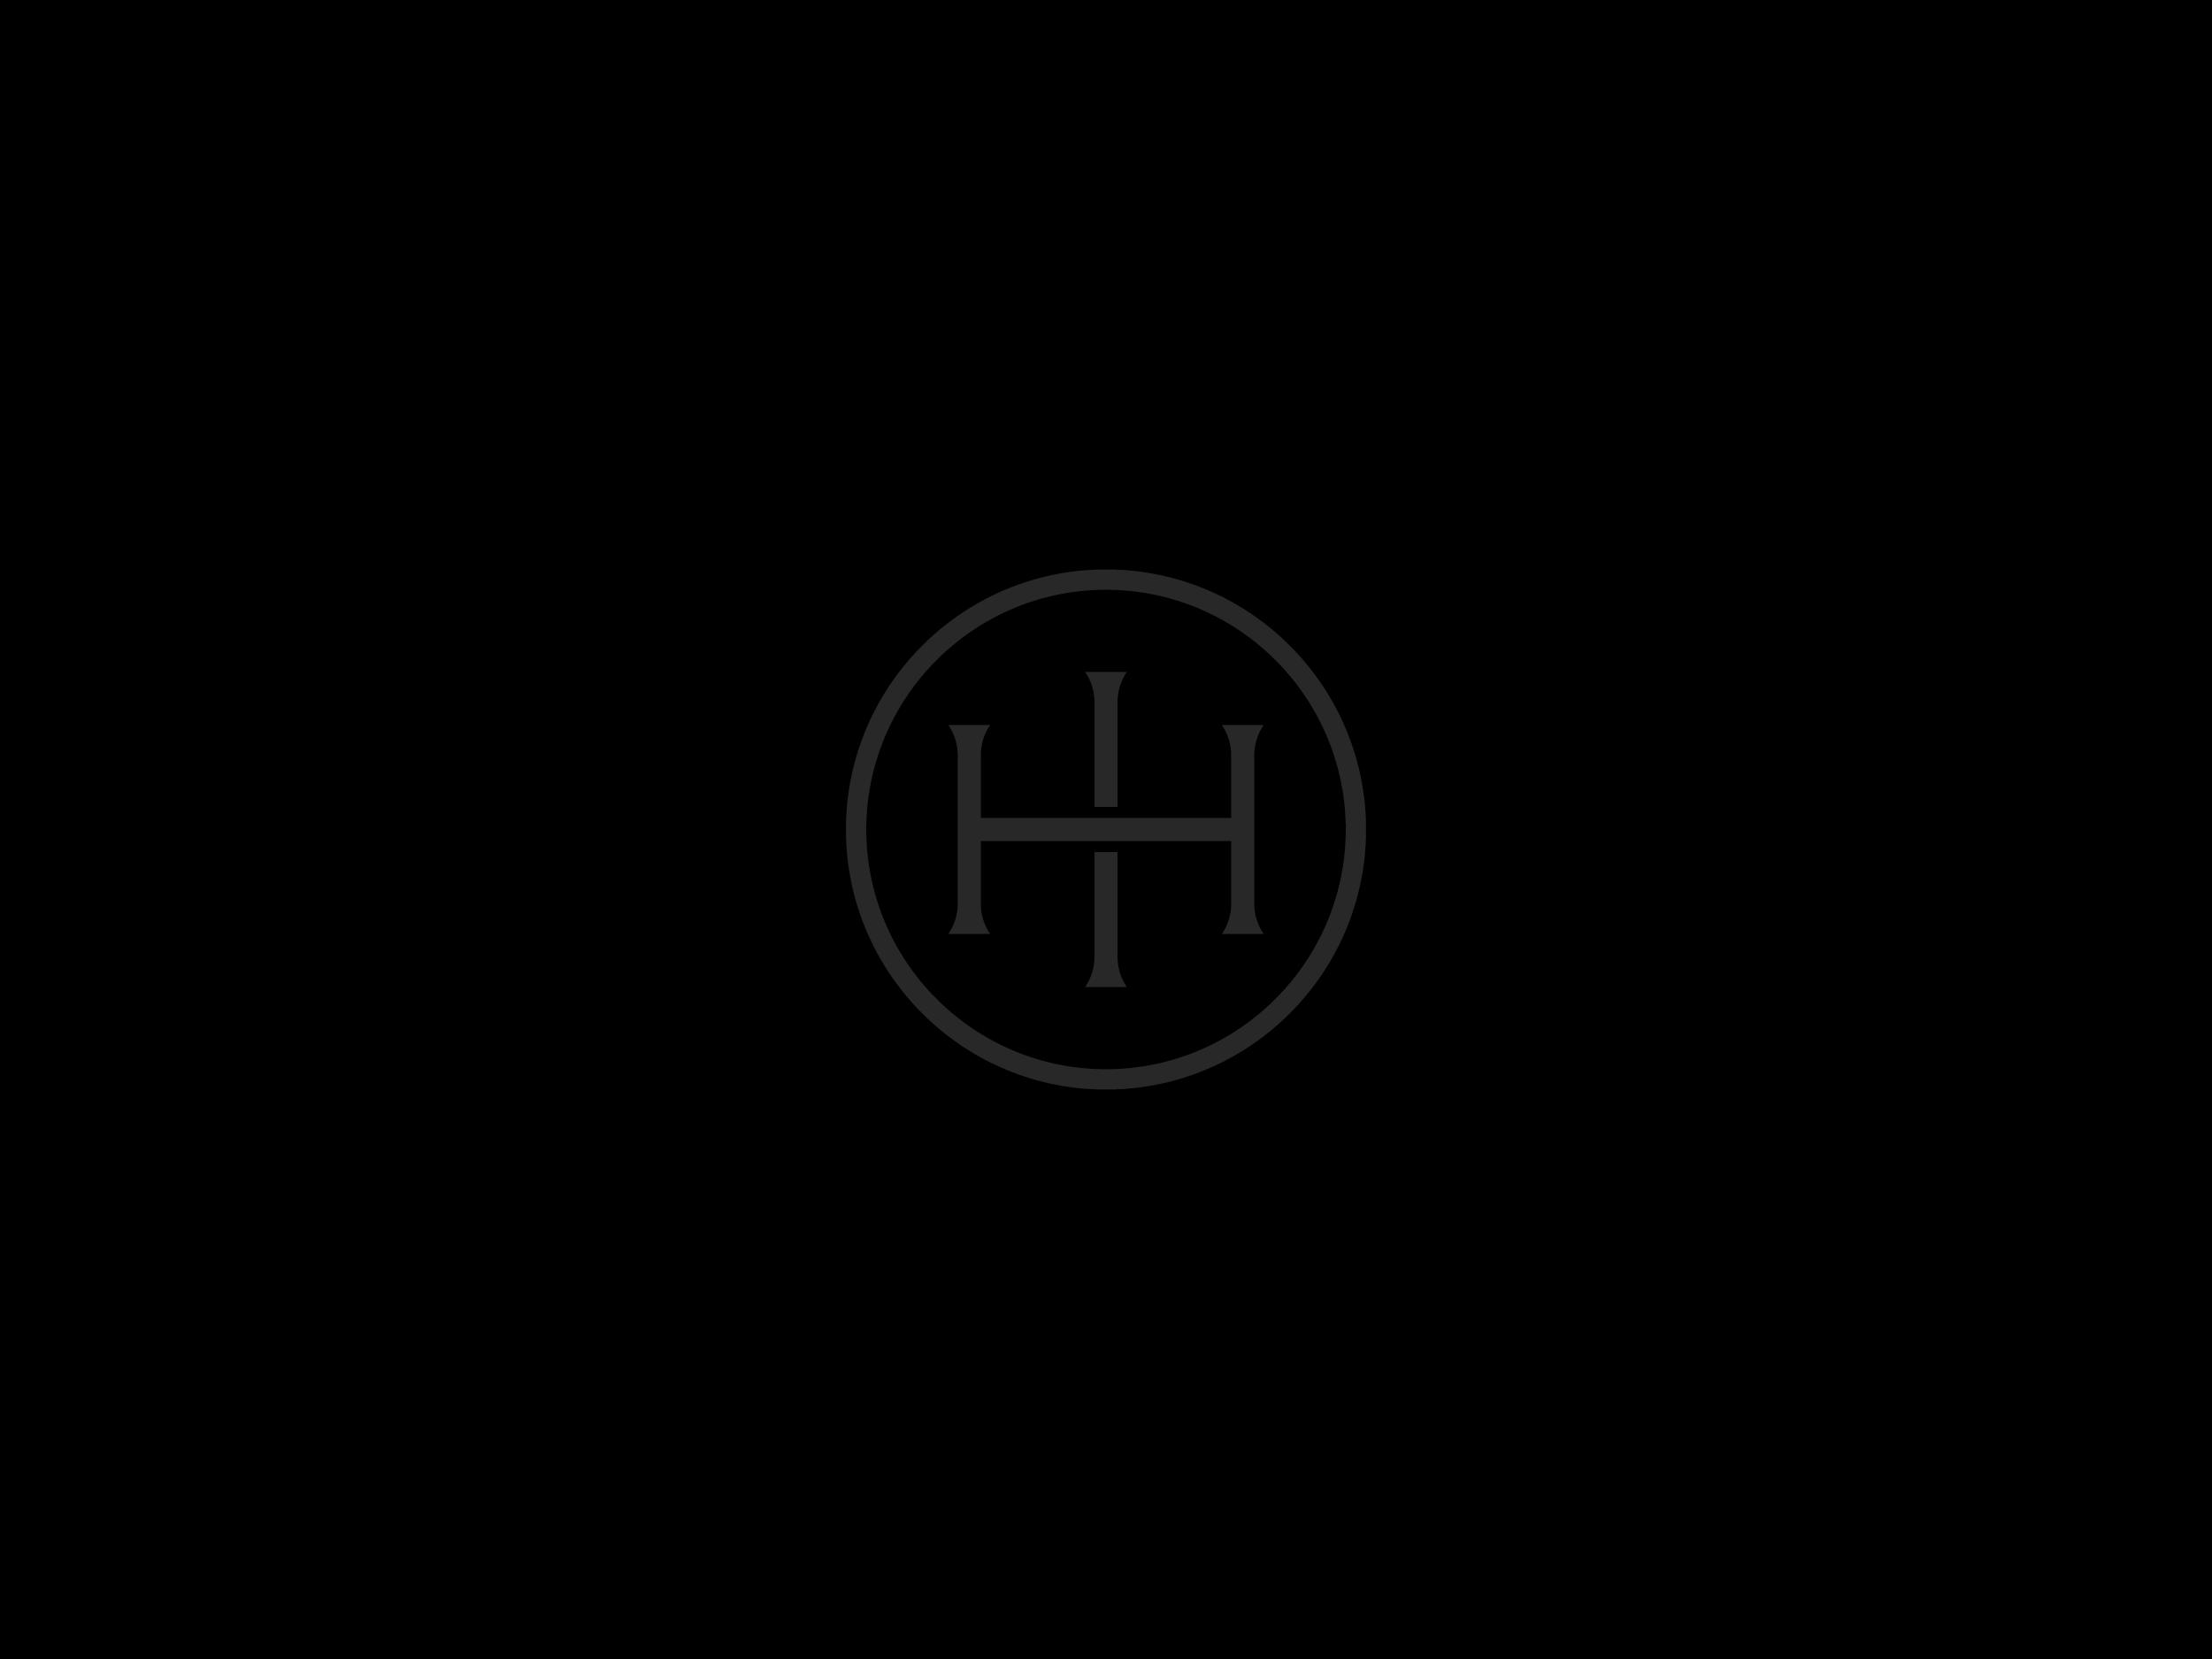 IH2.png